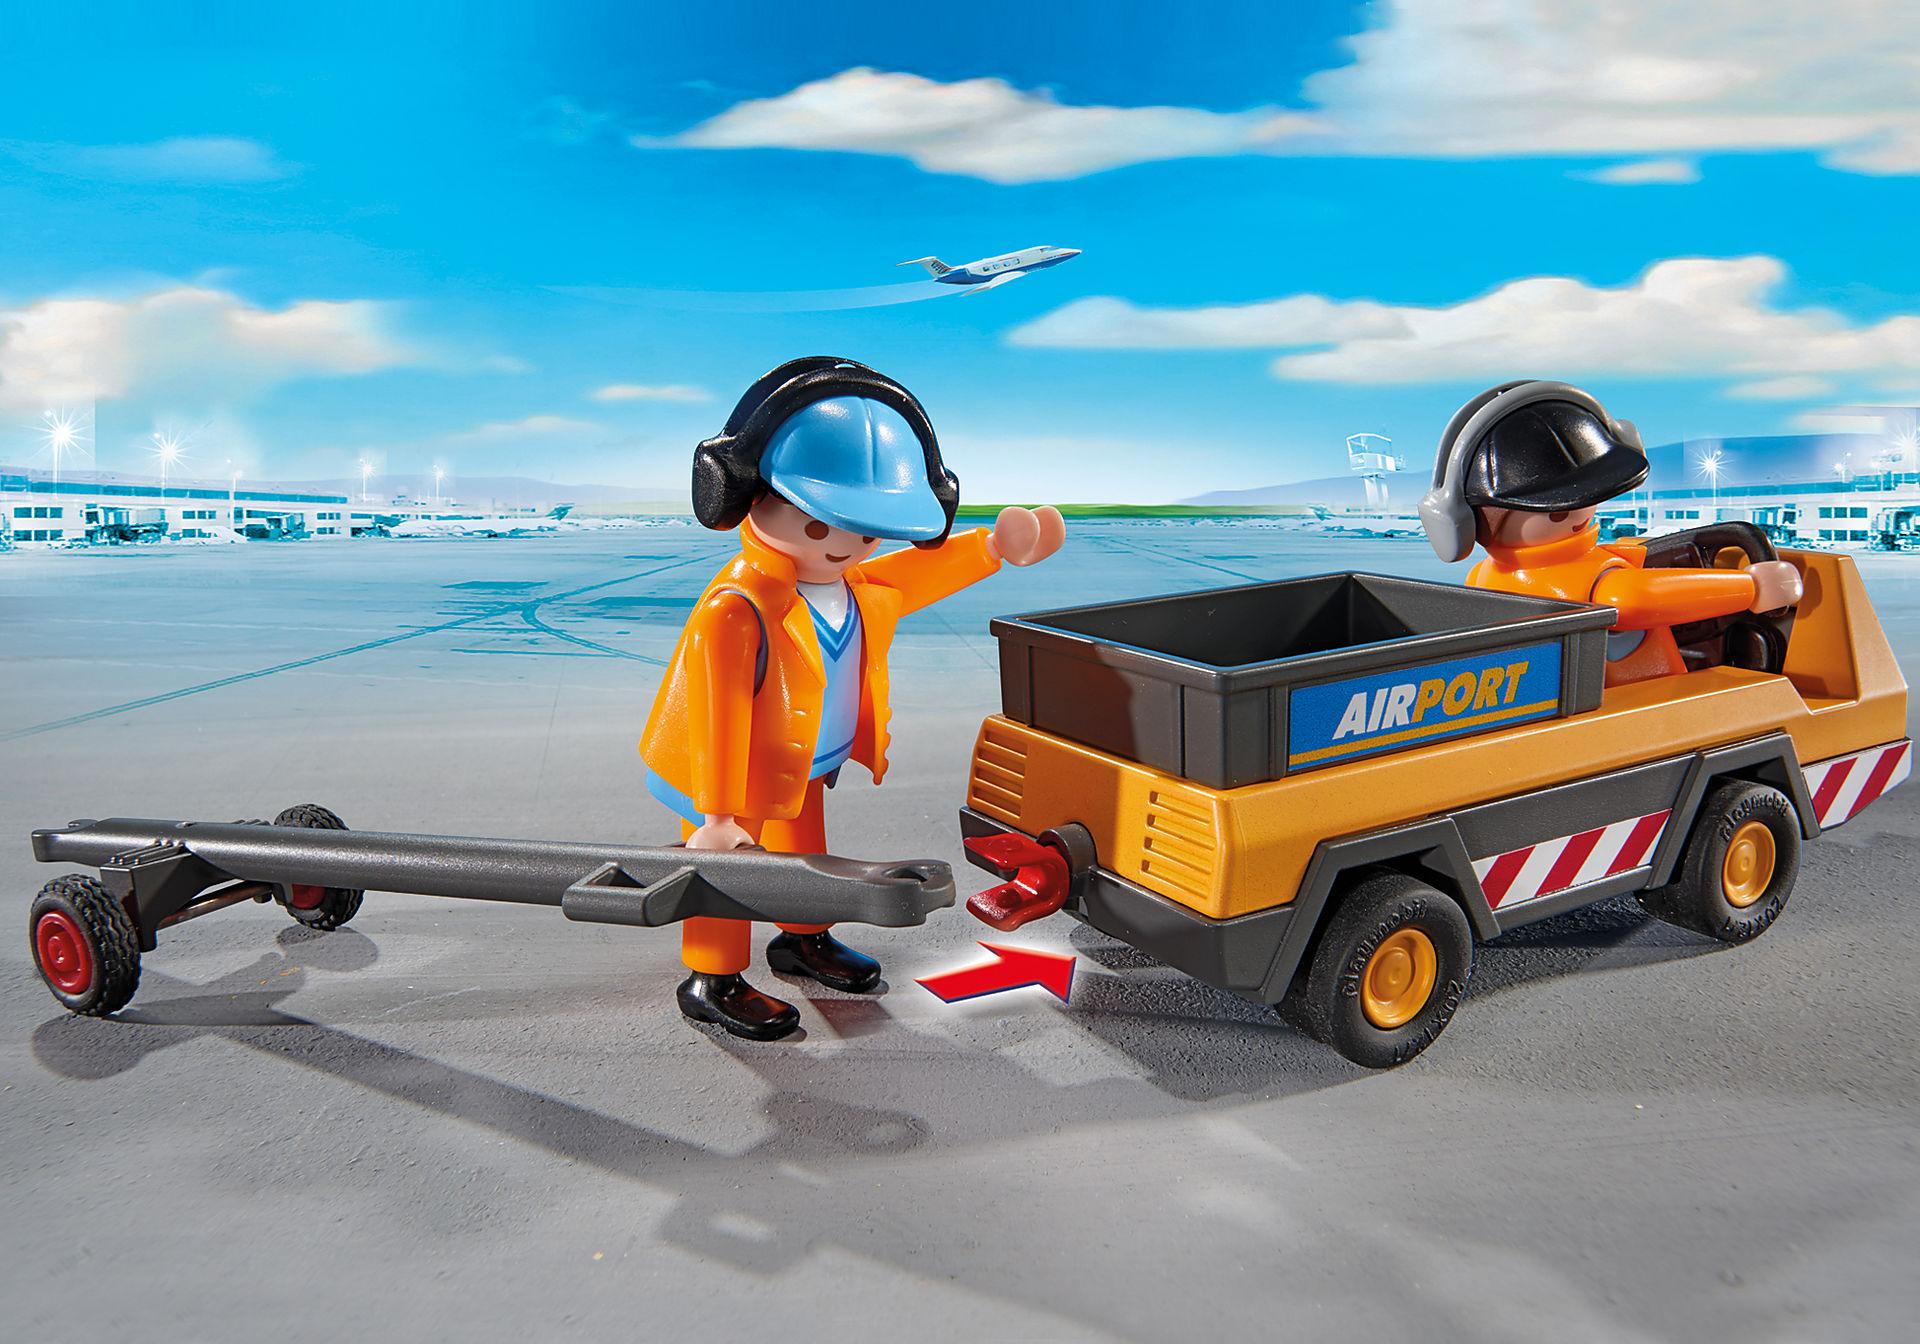 http://media.playmobil.com/i/playmobil/5396_product_extra1/Luchtverkeersleiders met bagagetransport